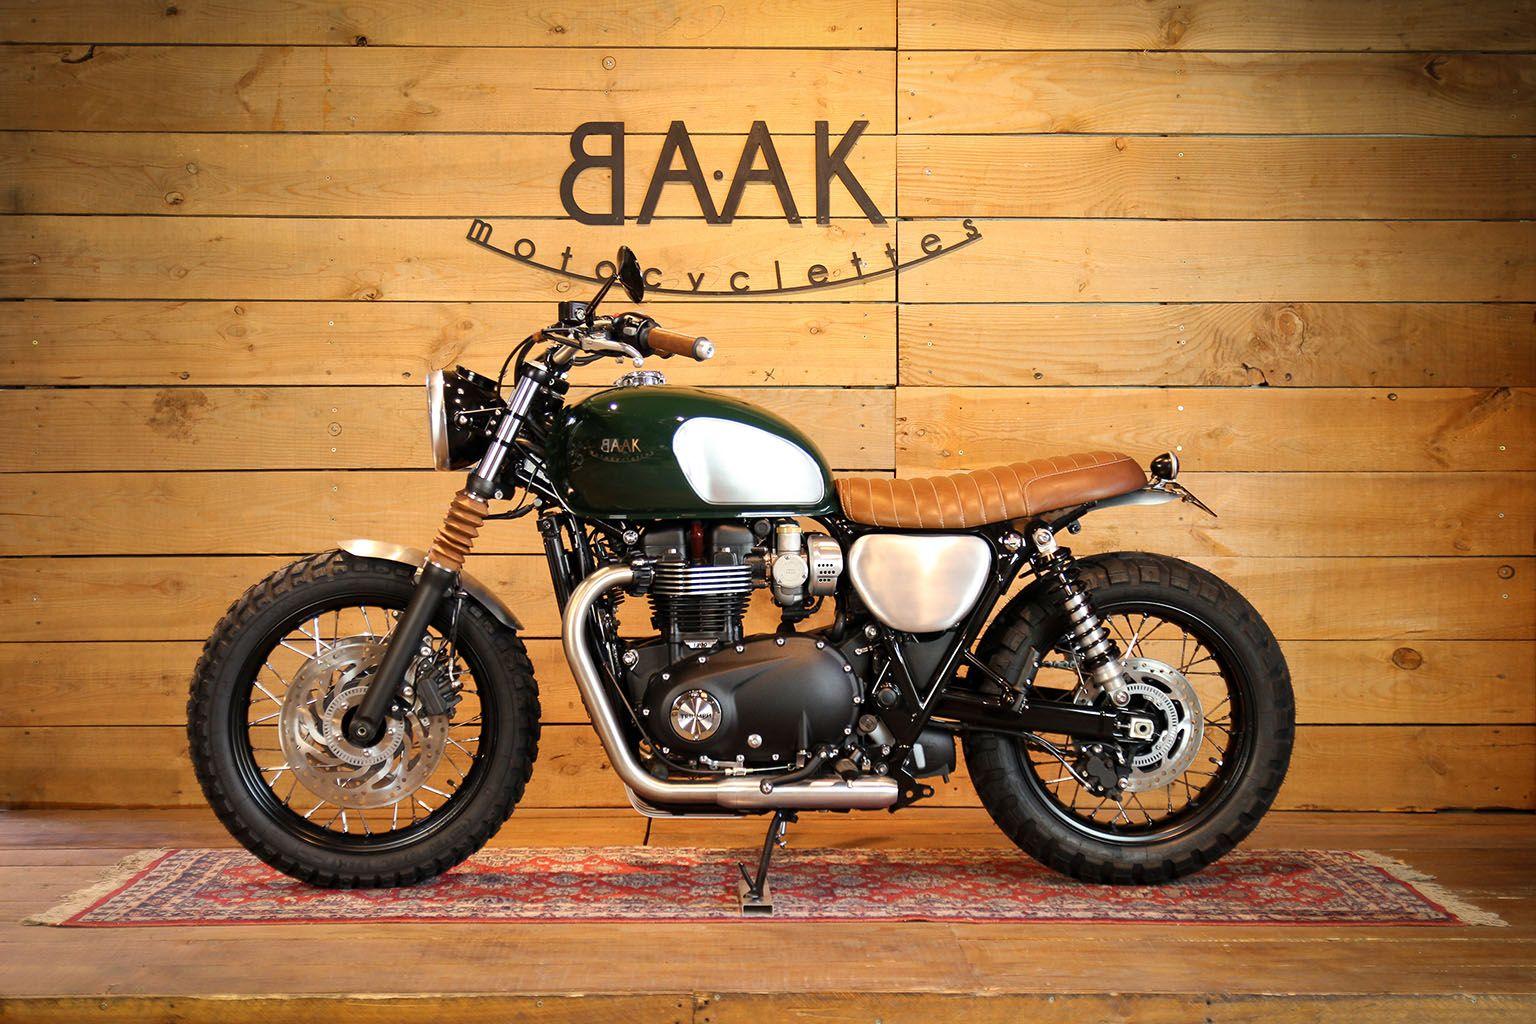 Custom Motorcycles Showroom In Lyon France Bikes Triumph